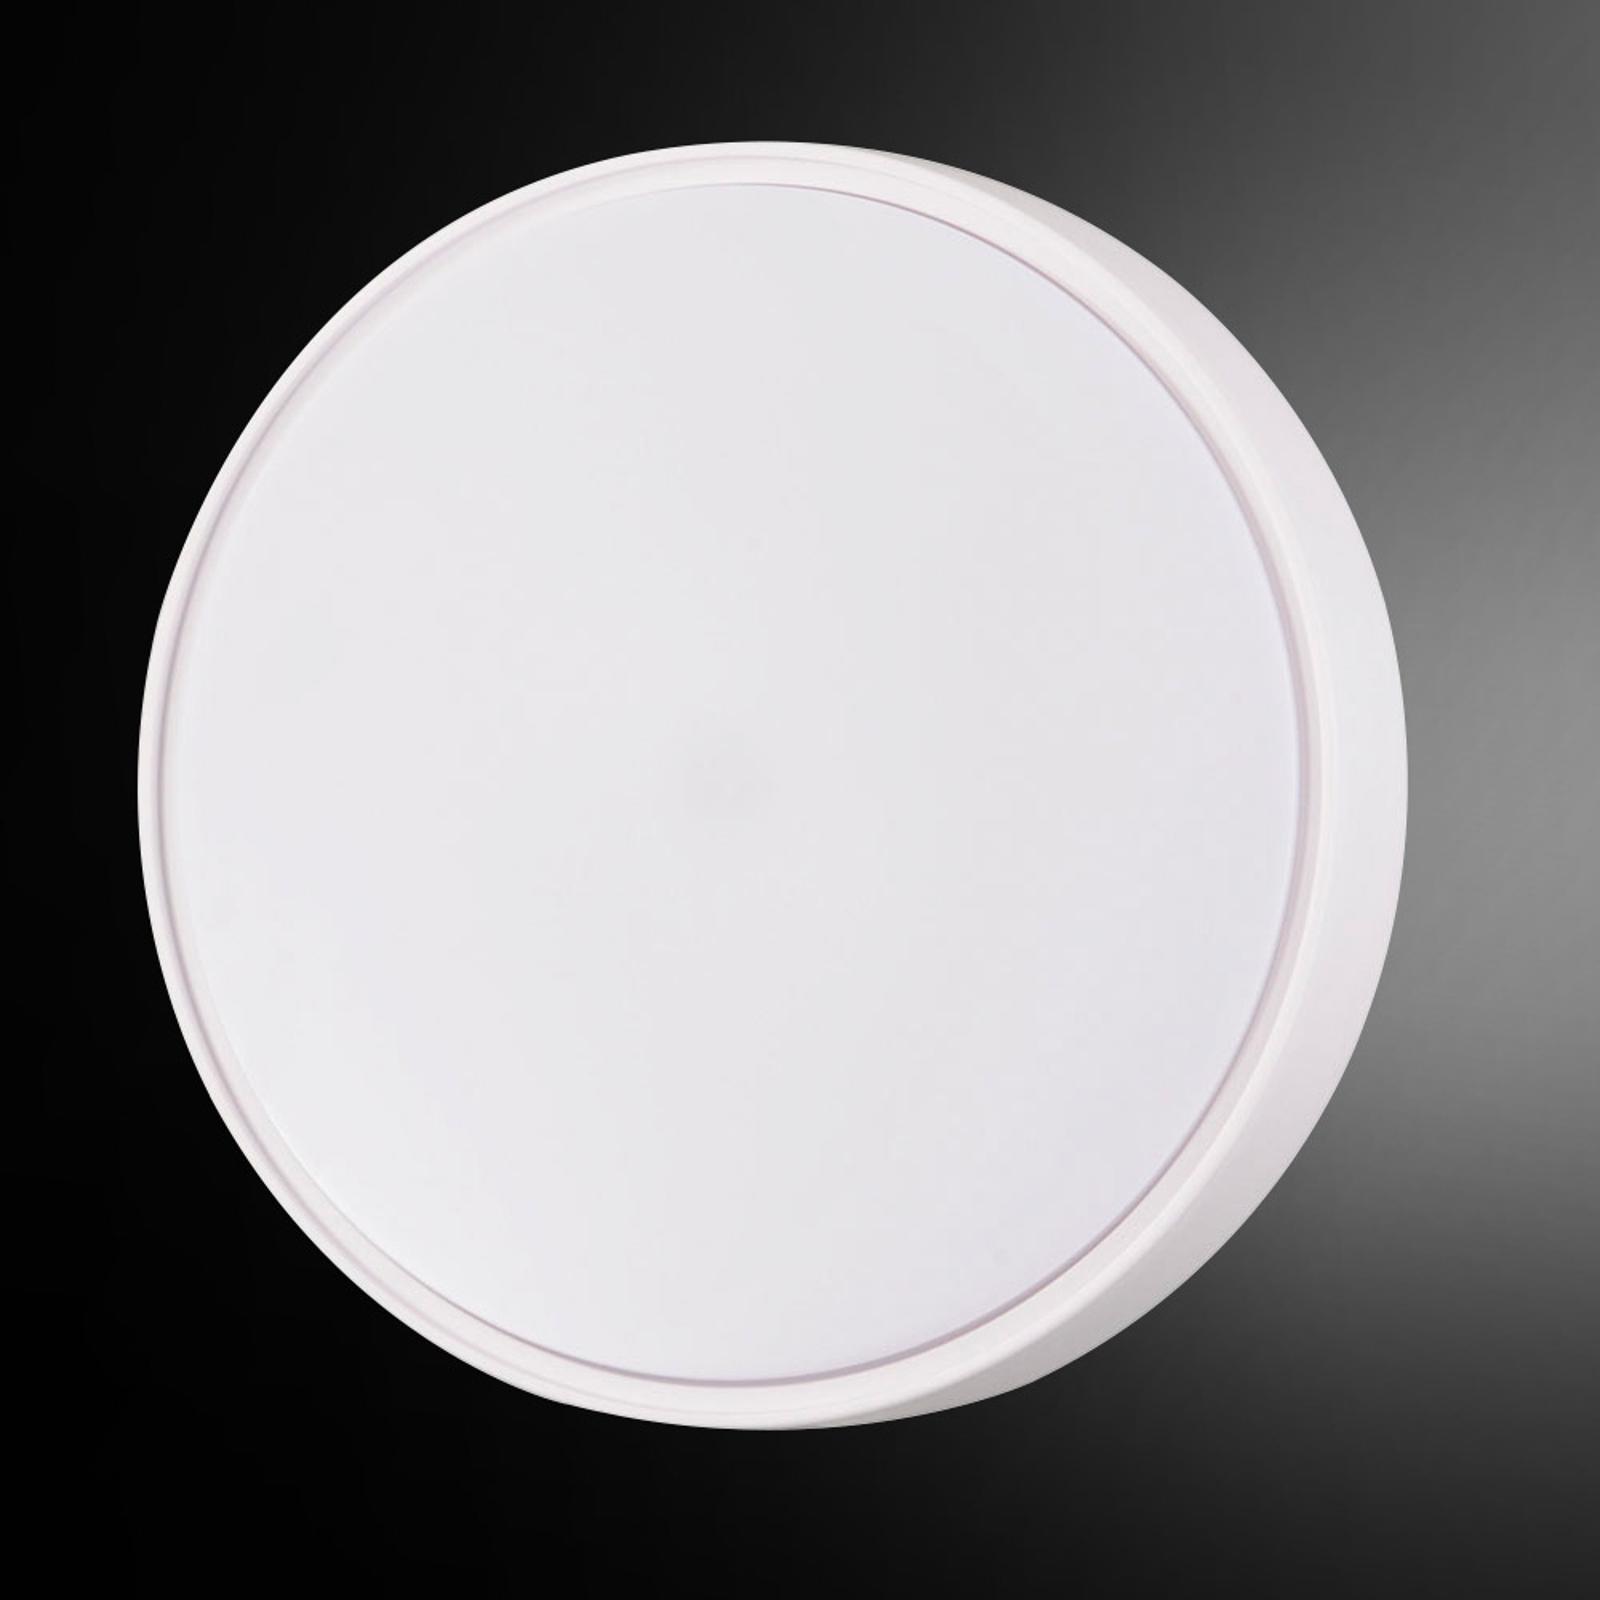 Hatton bright LED wall light IP65 30 cm_3502458_1